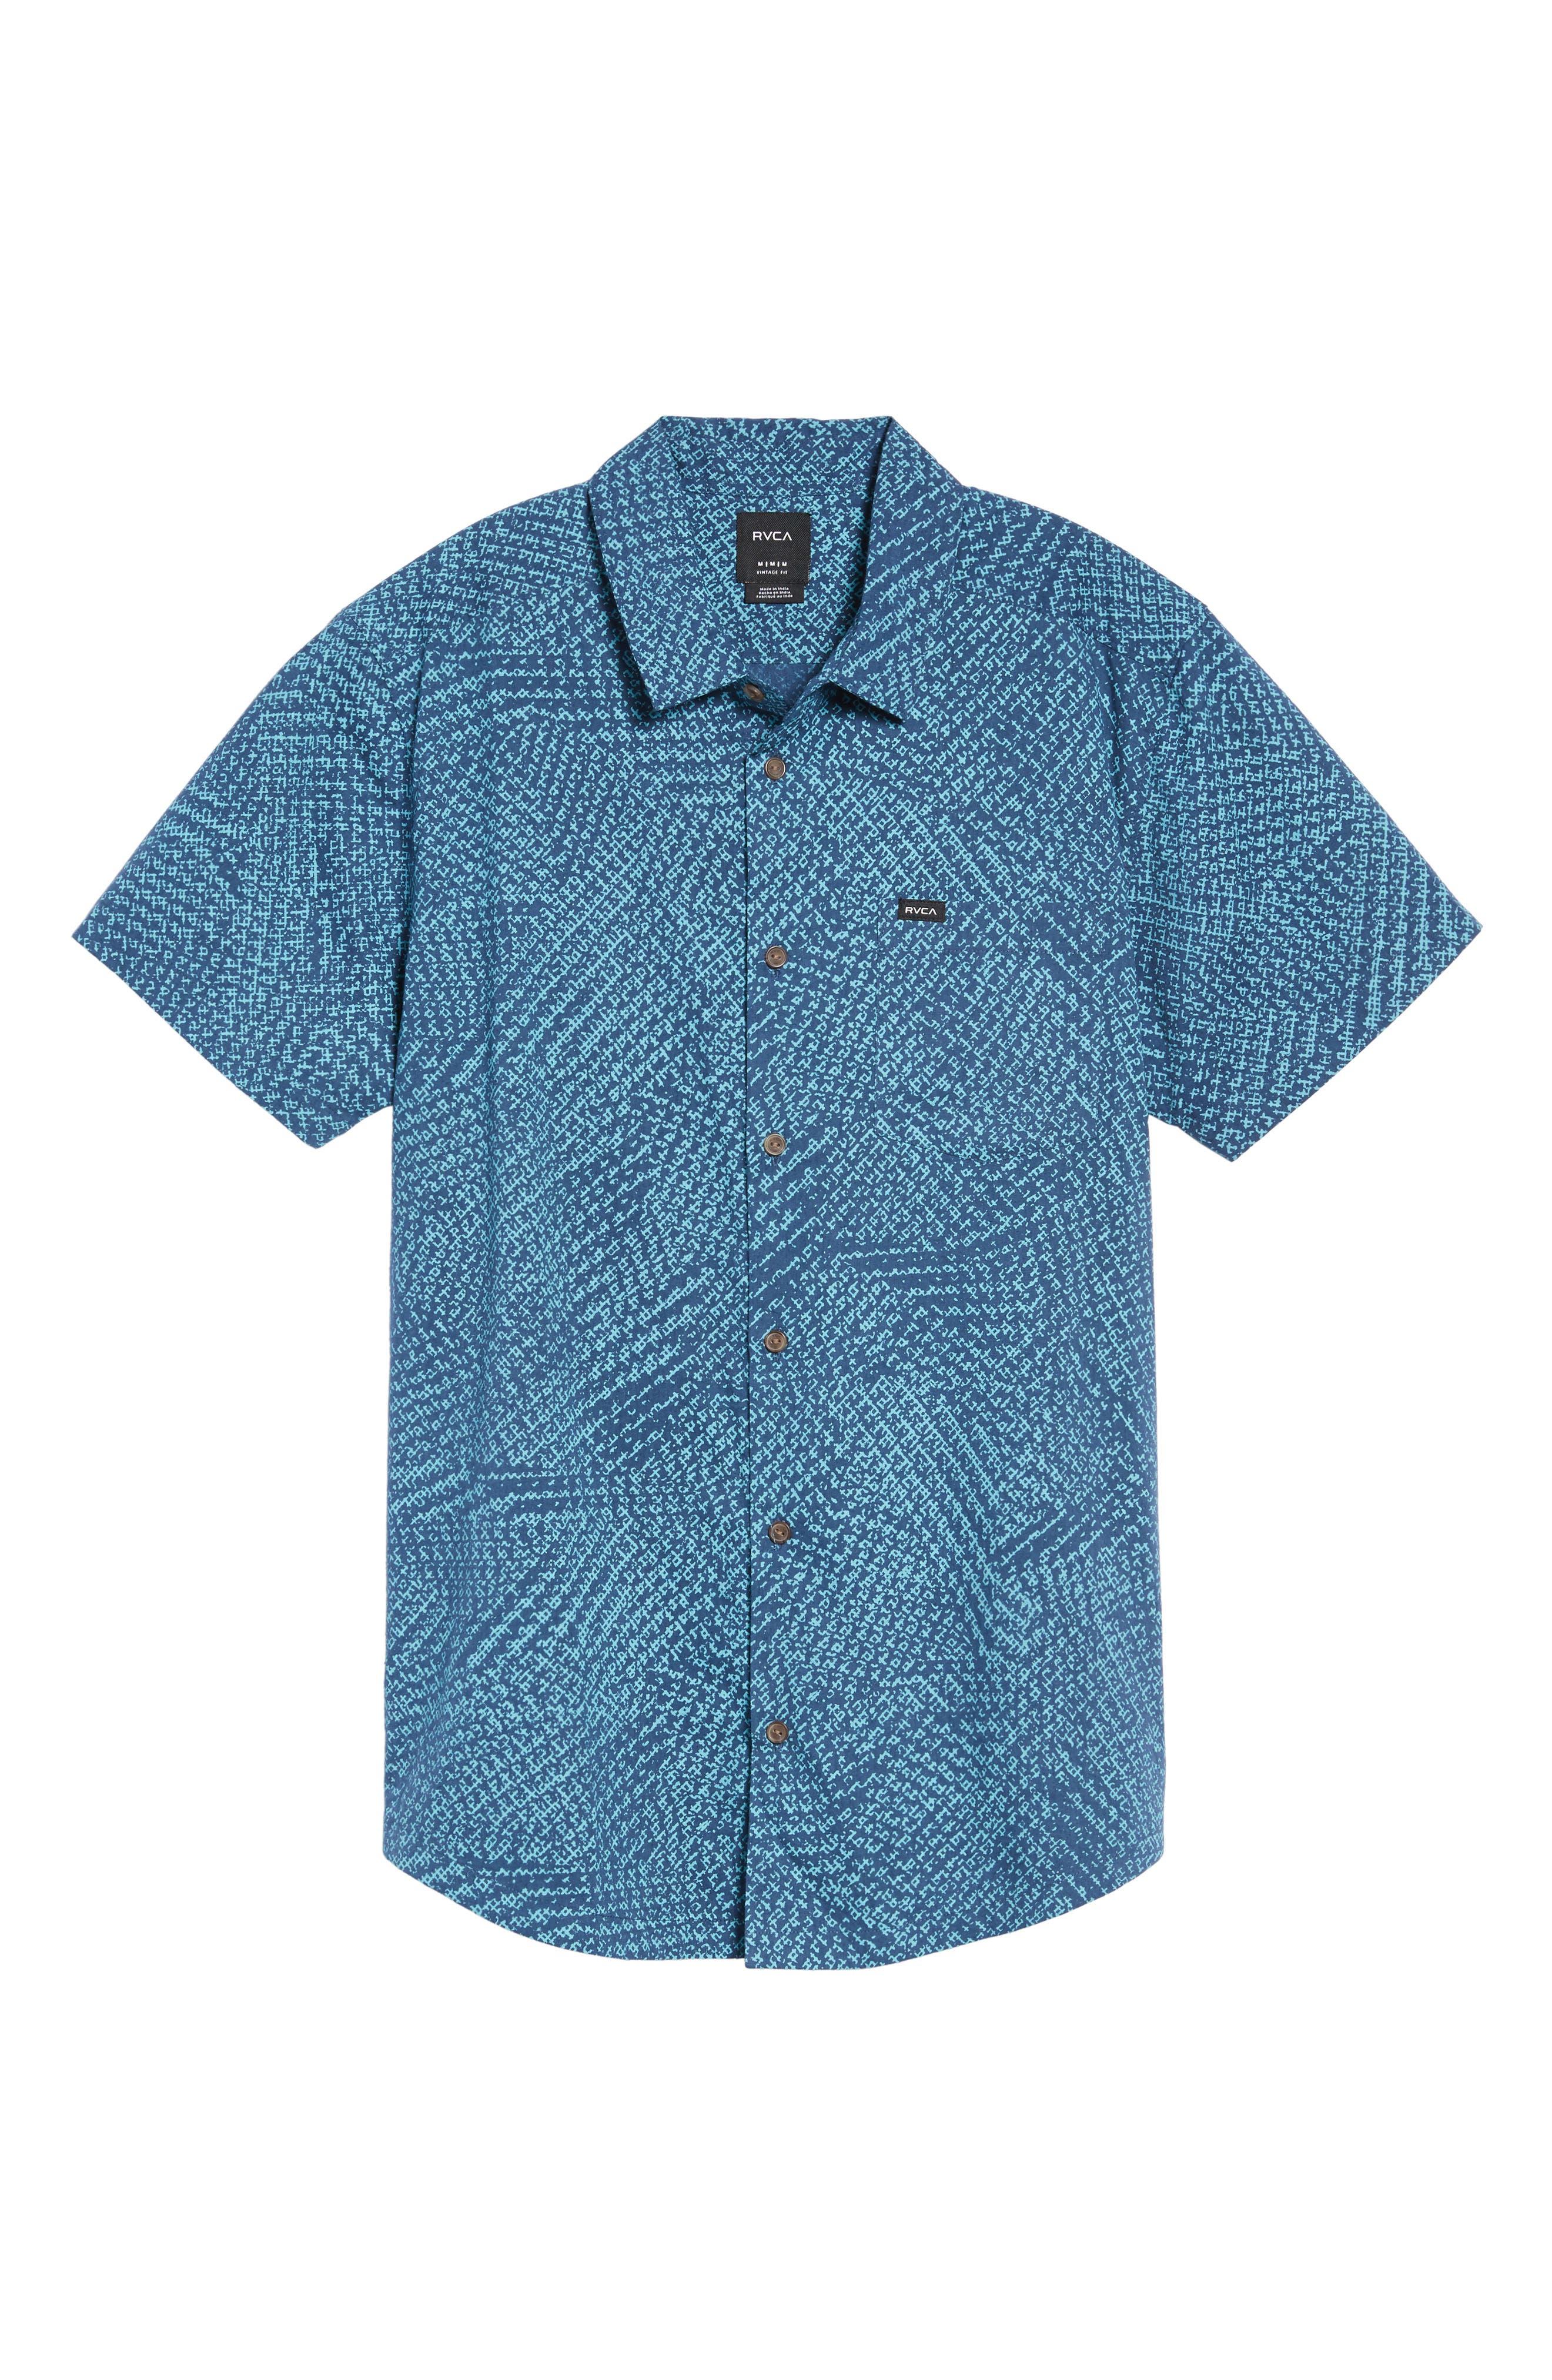 Grid Woven Shirt,                             Alternate thumbnail 6, color,                             497